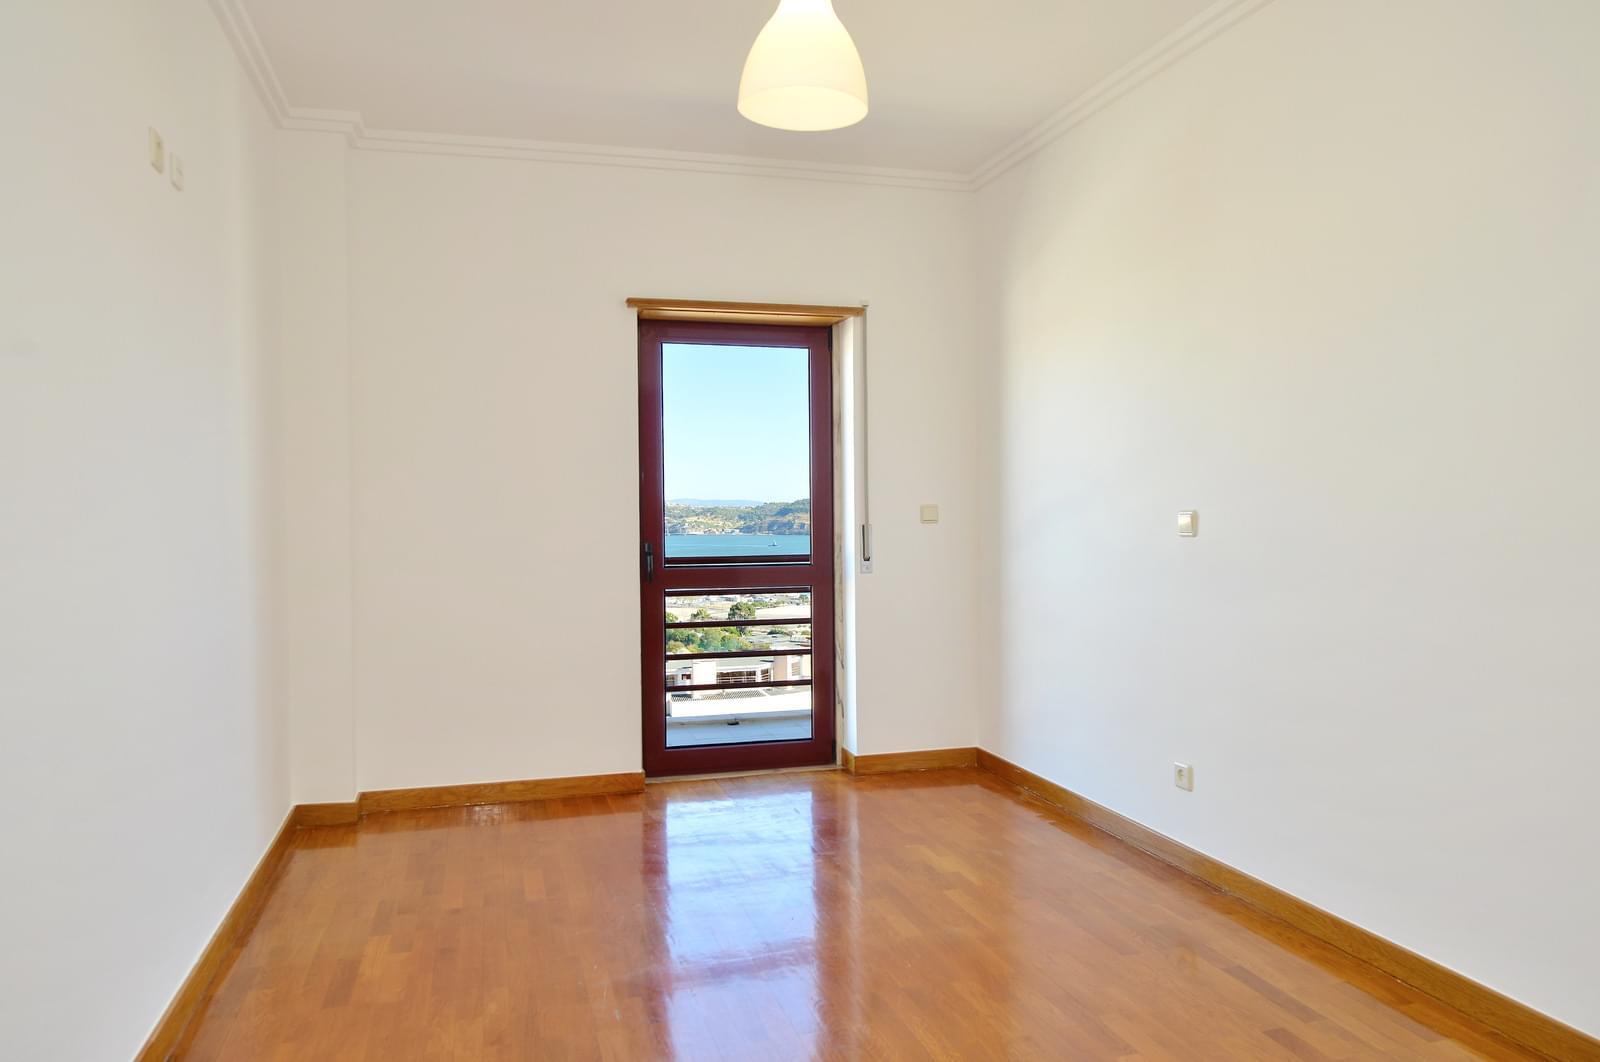 pf17174-apartamento-t3-oeiras-315e7d08-4852-4966-ae01-1c0d38283c59